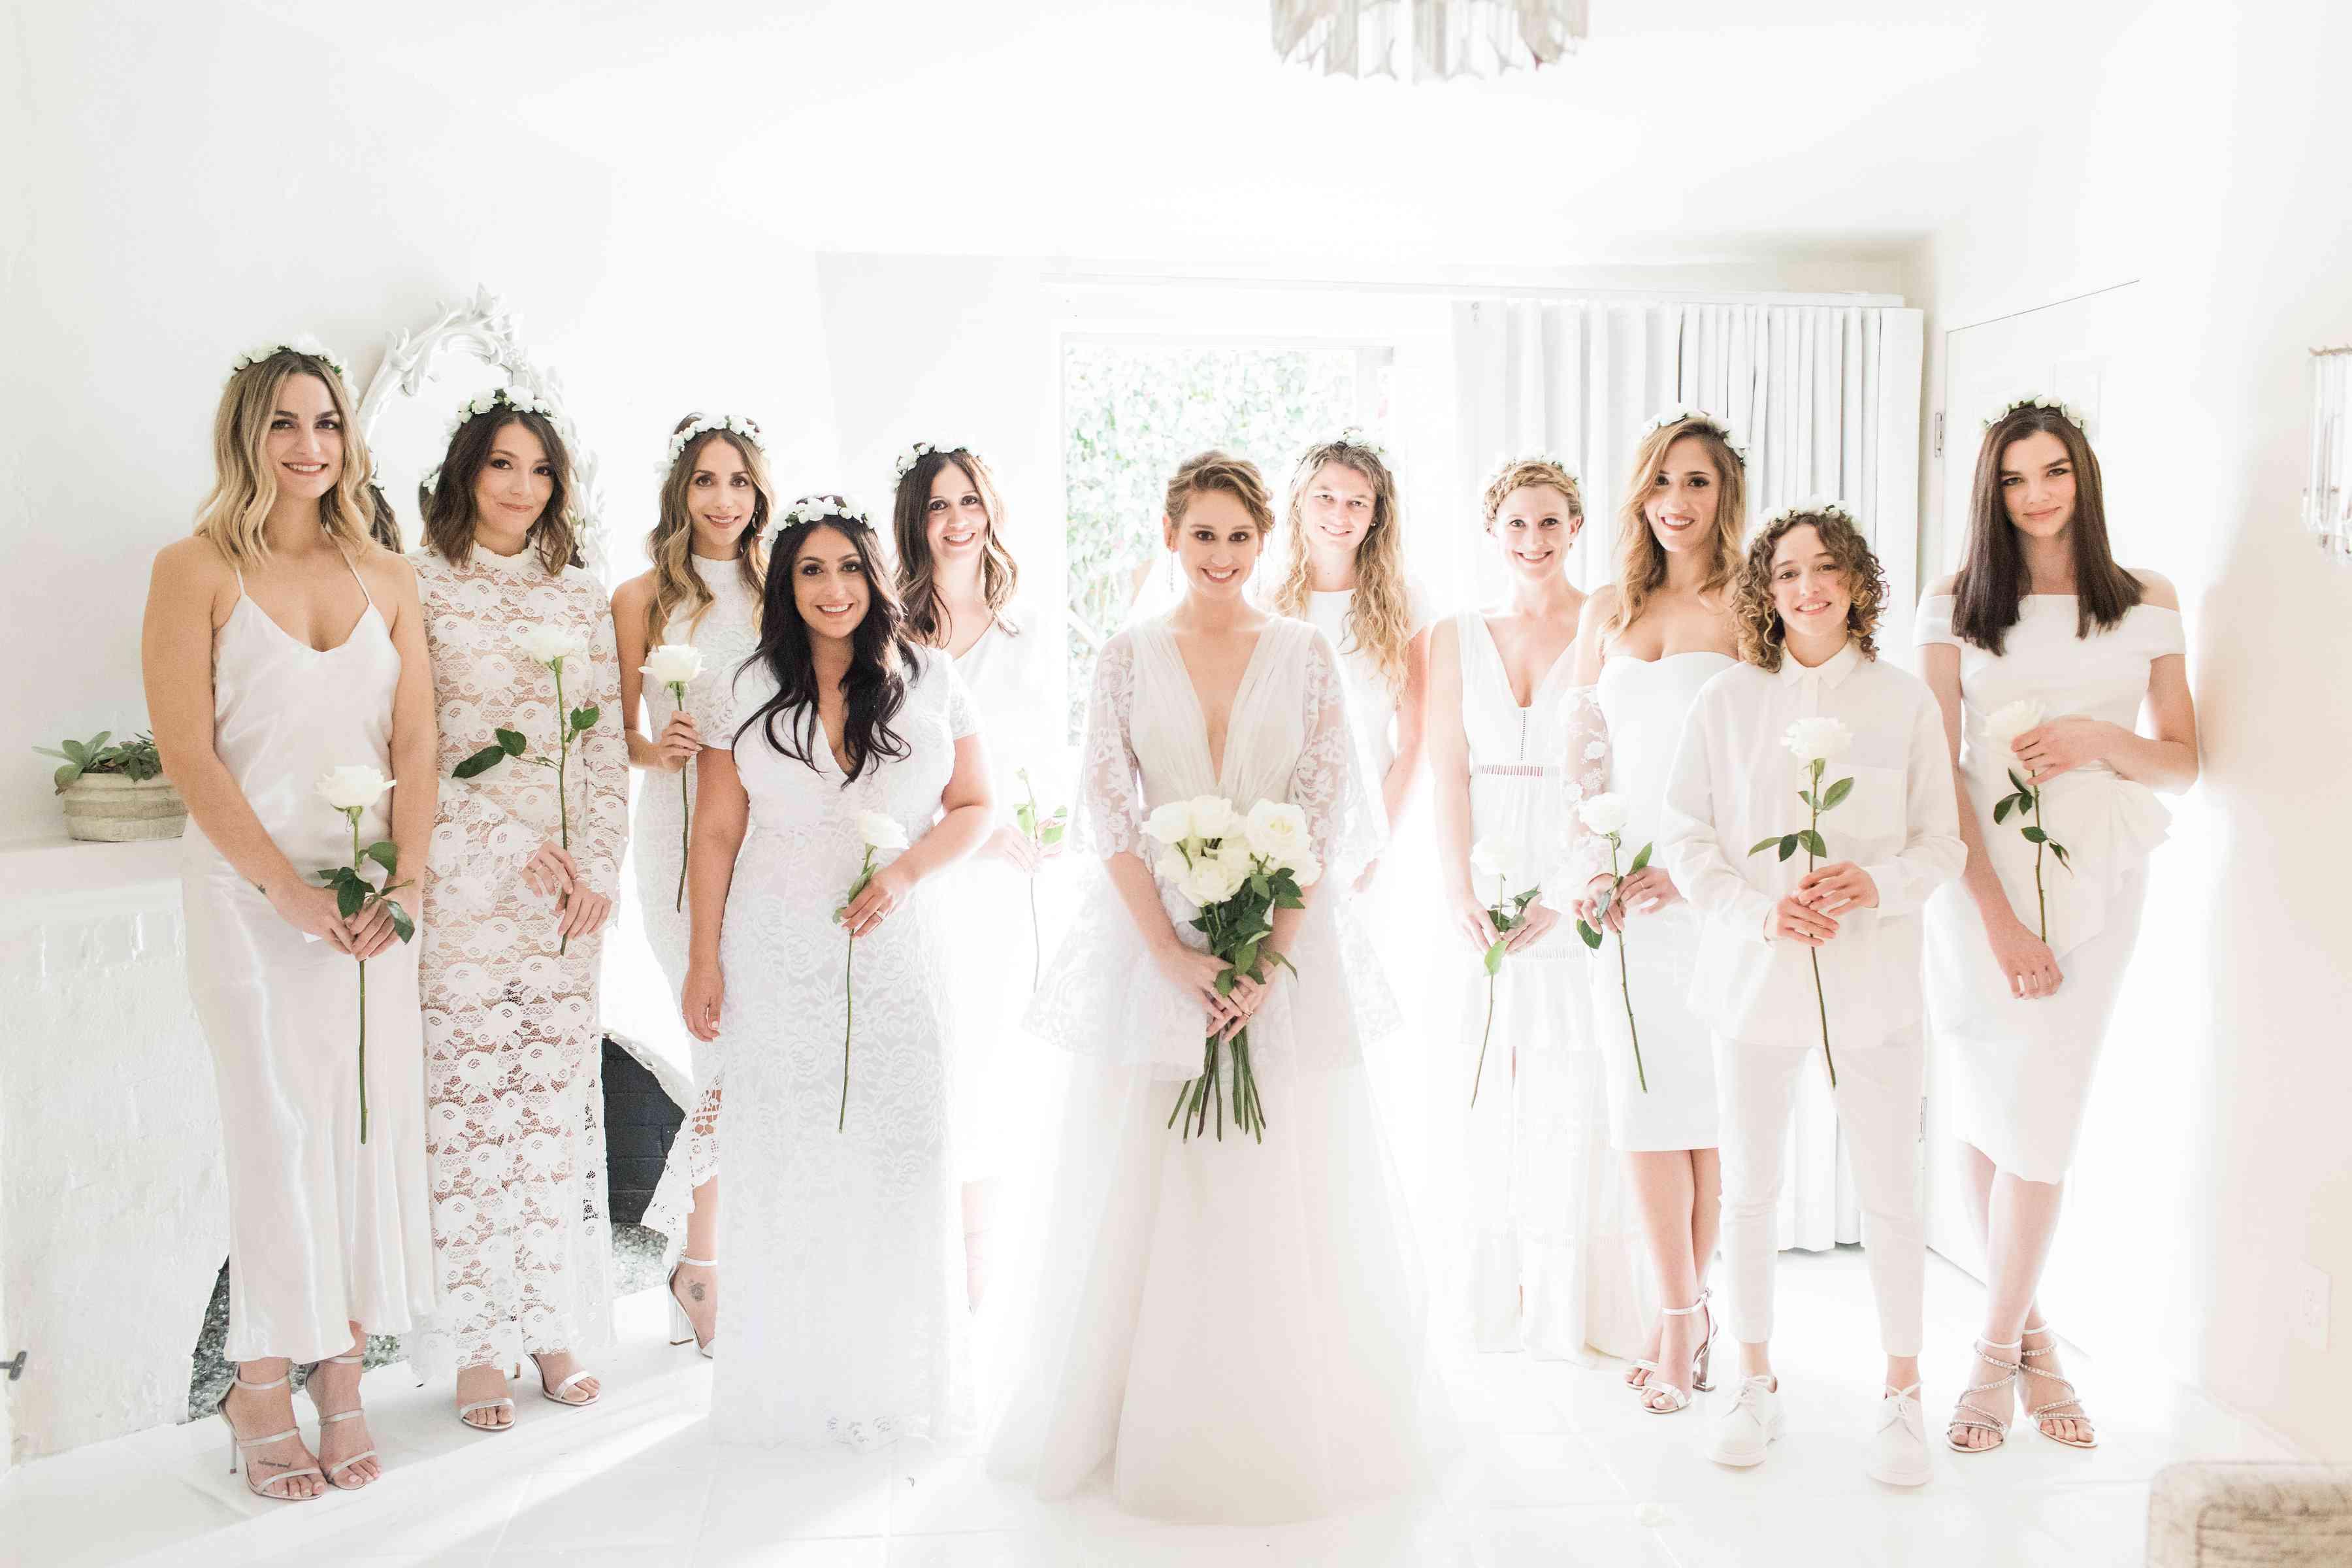 <p>bridesmaids in mismatched white dresses</p><br><br>